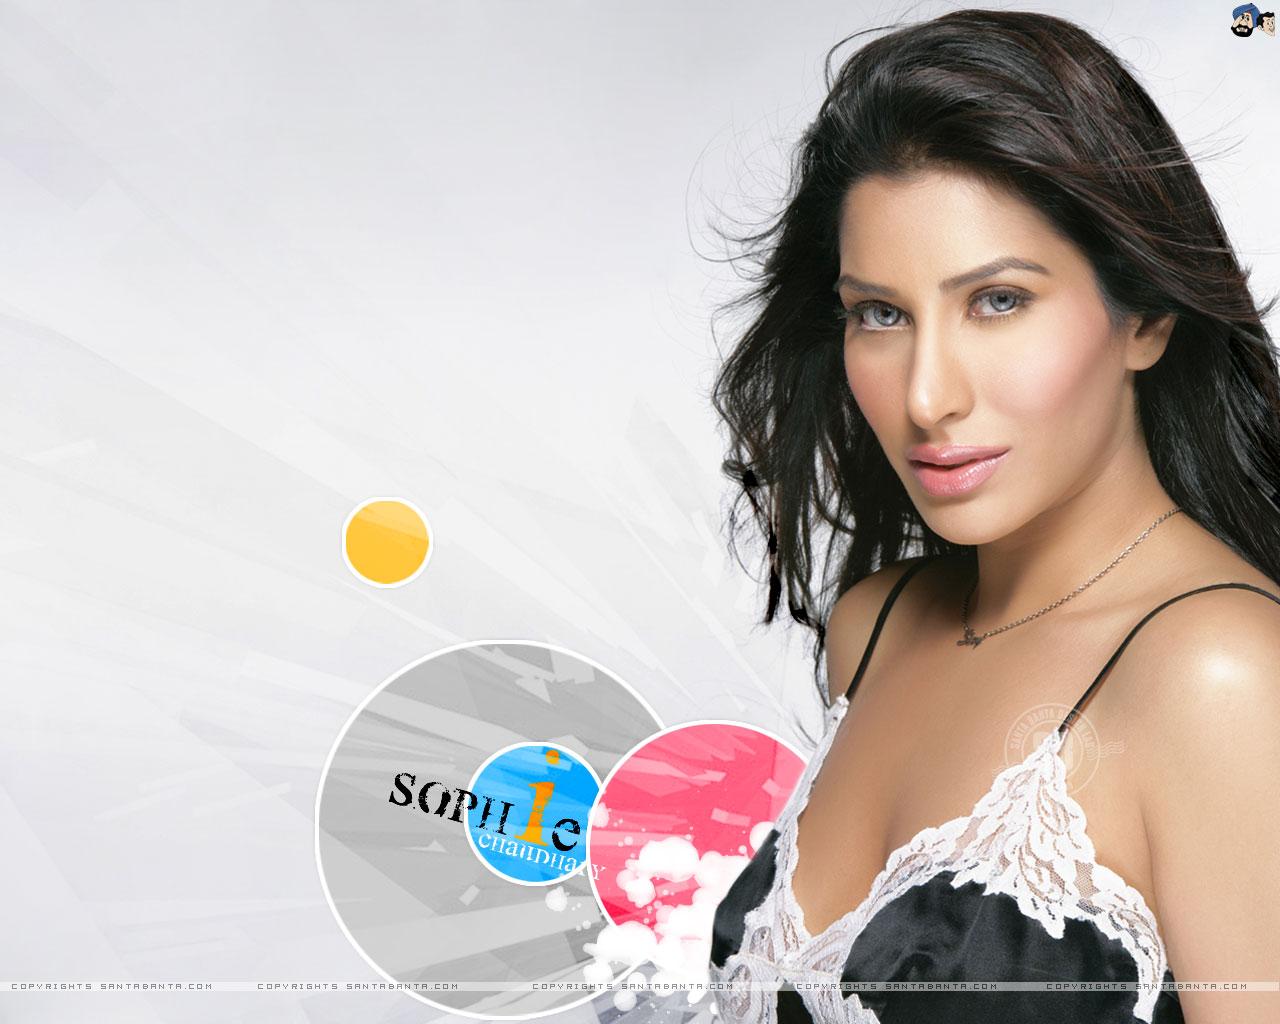 Sophie Choudhary Hot